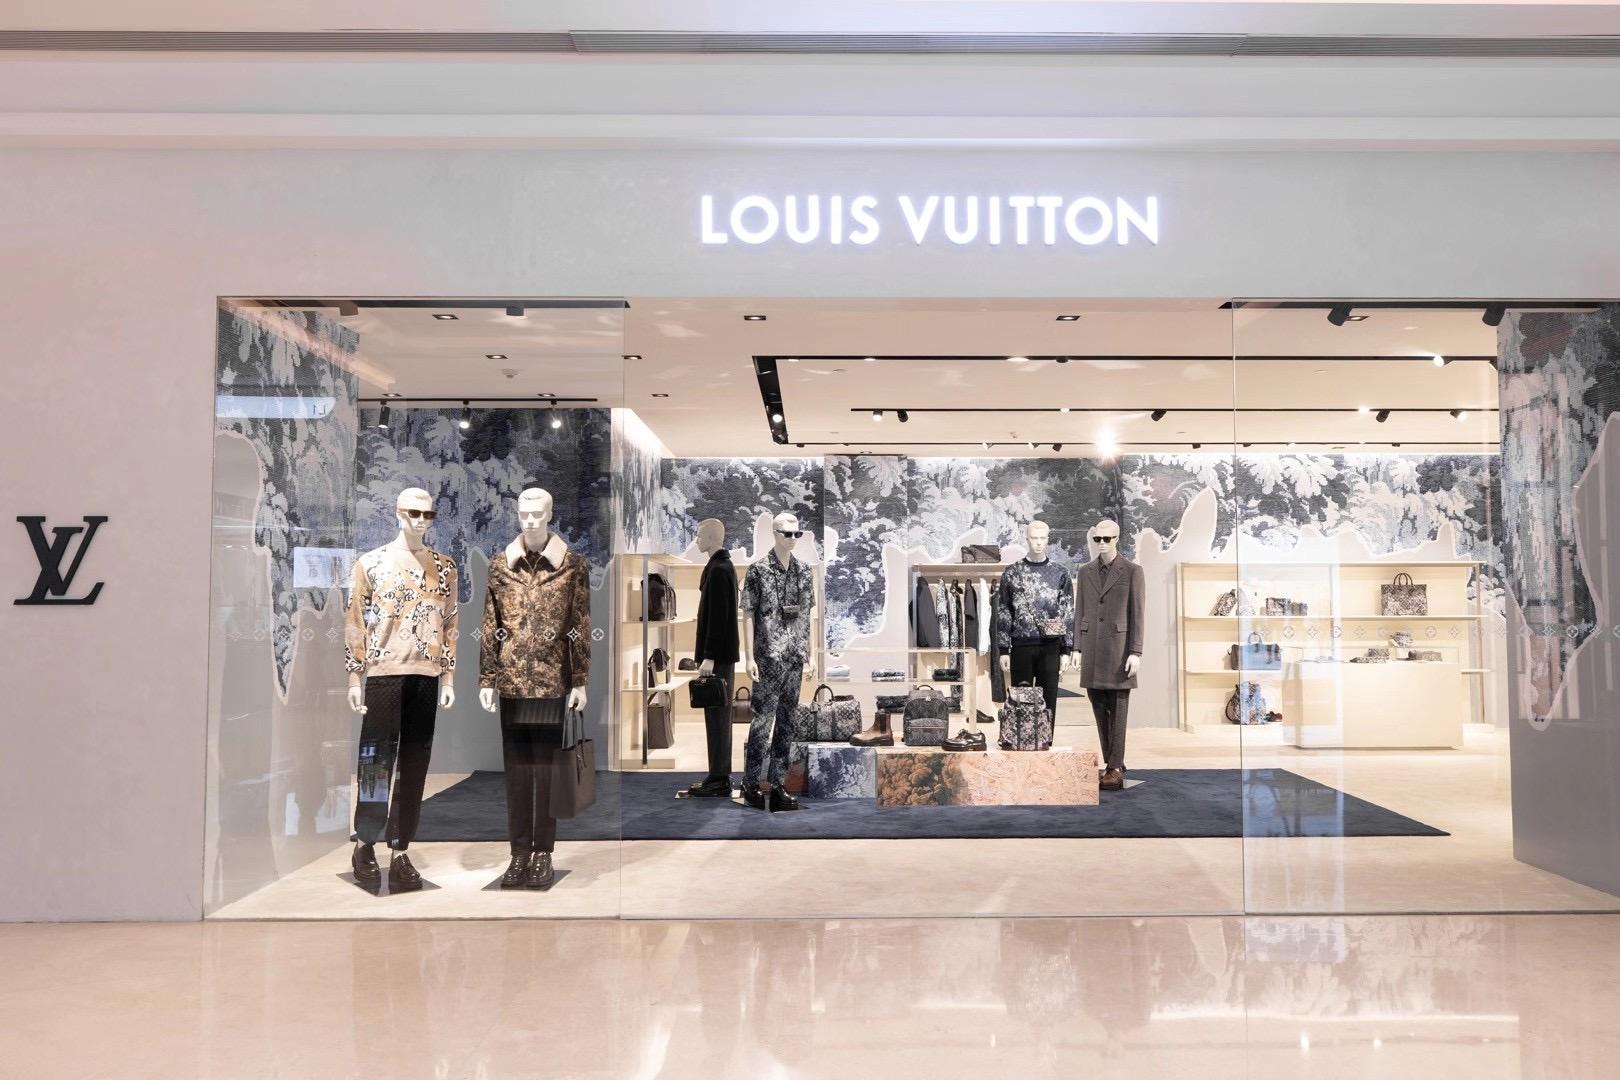 Louis Vuitton 2020 Men's Pre-Coll Pop Up Nov 13th – Dec 13th Harbin/Jinan/Xi'an – 9